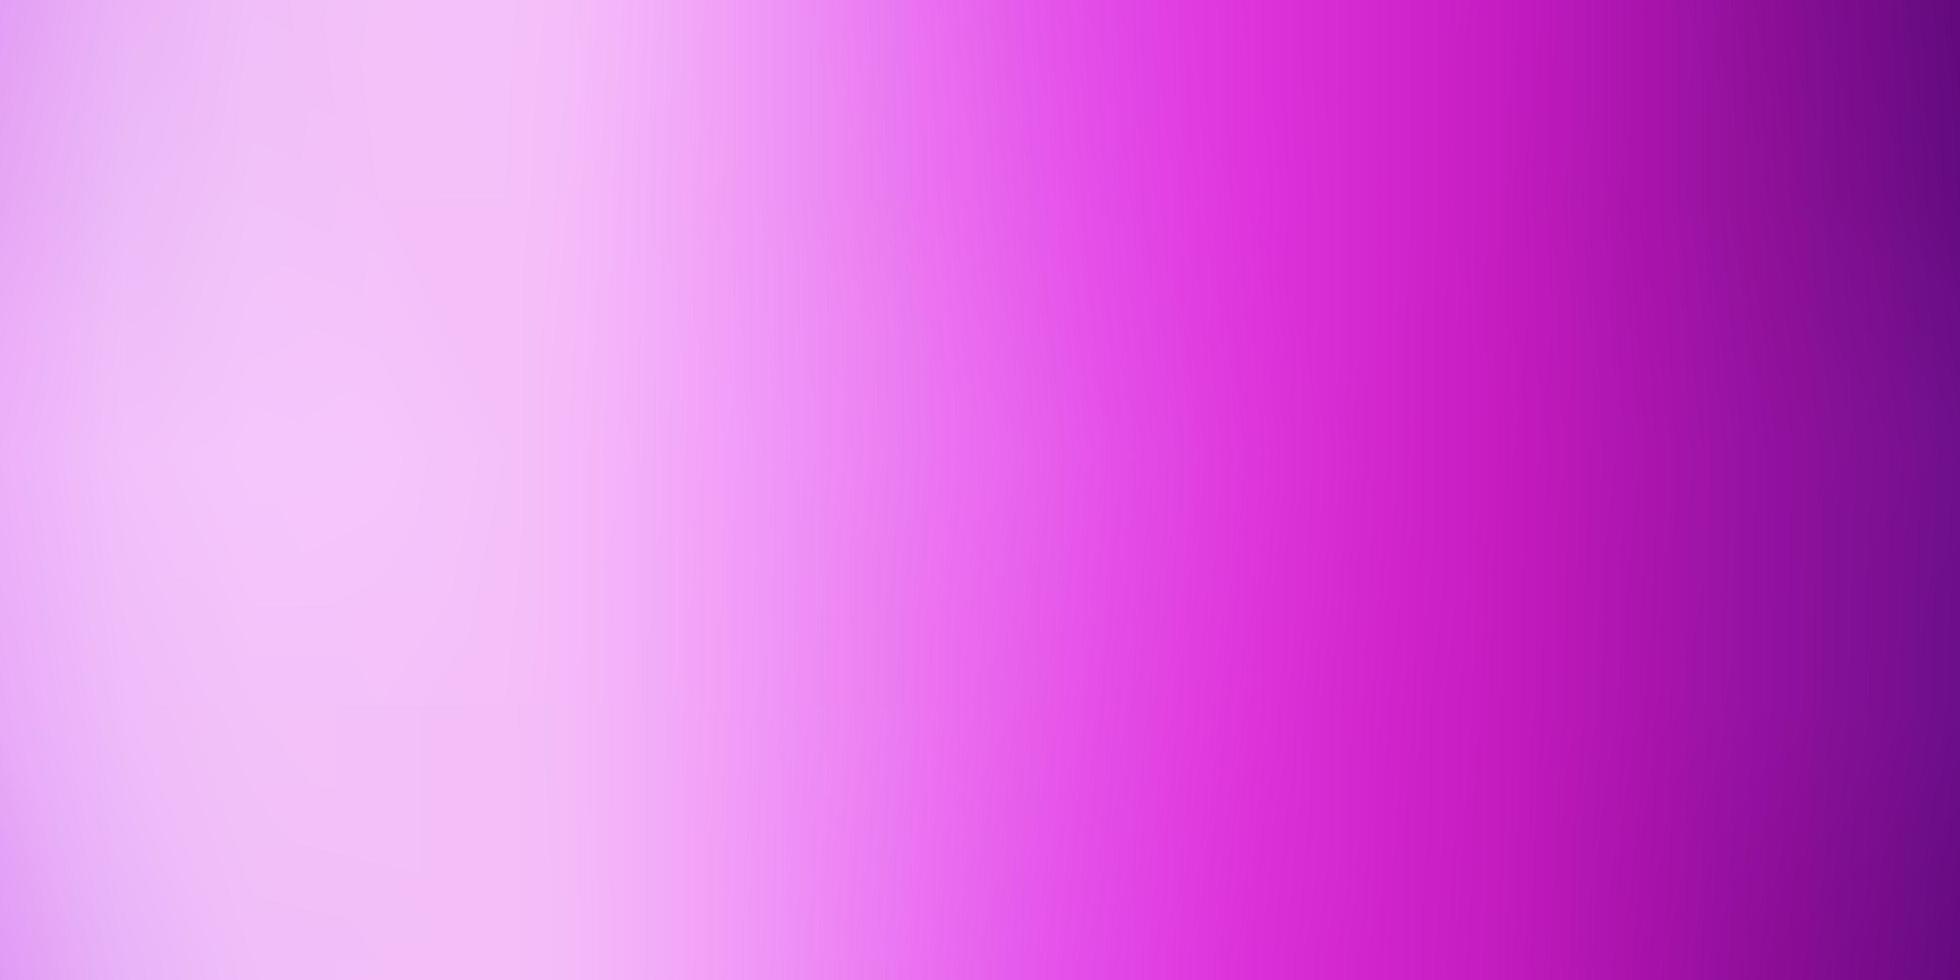 patrón borroso inteligente vector púrpura claro, rosa.